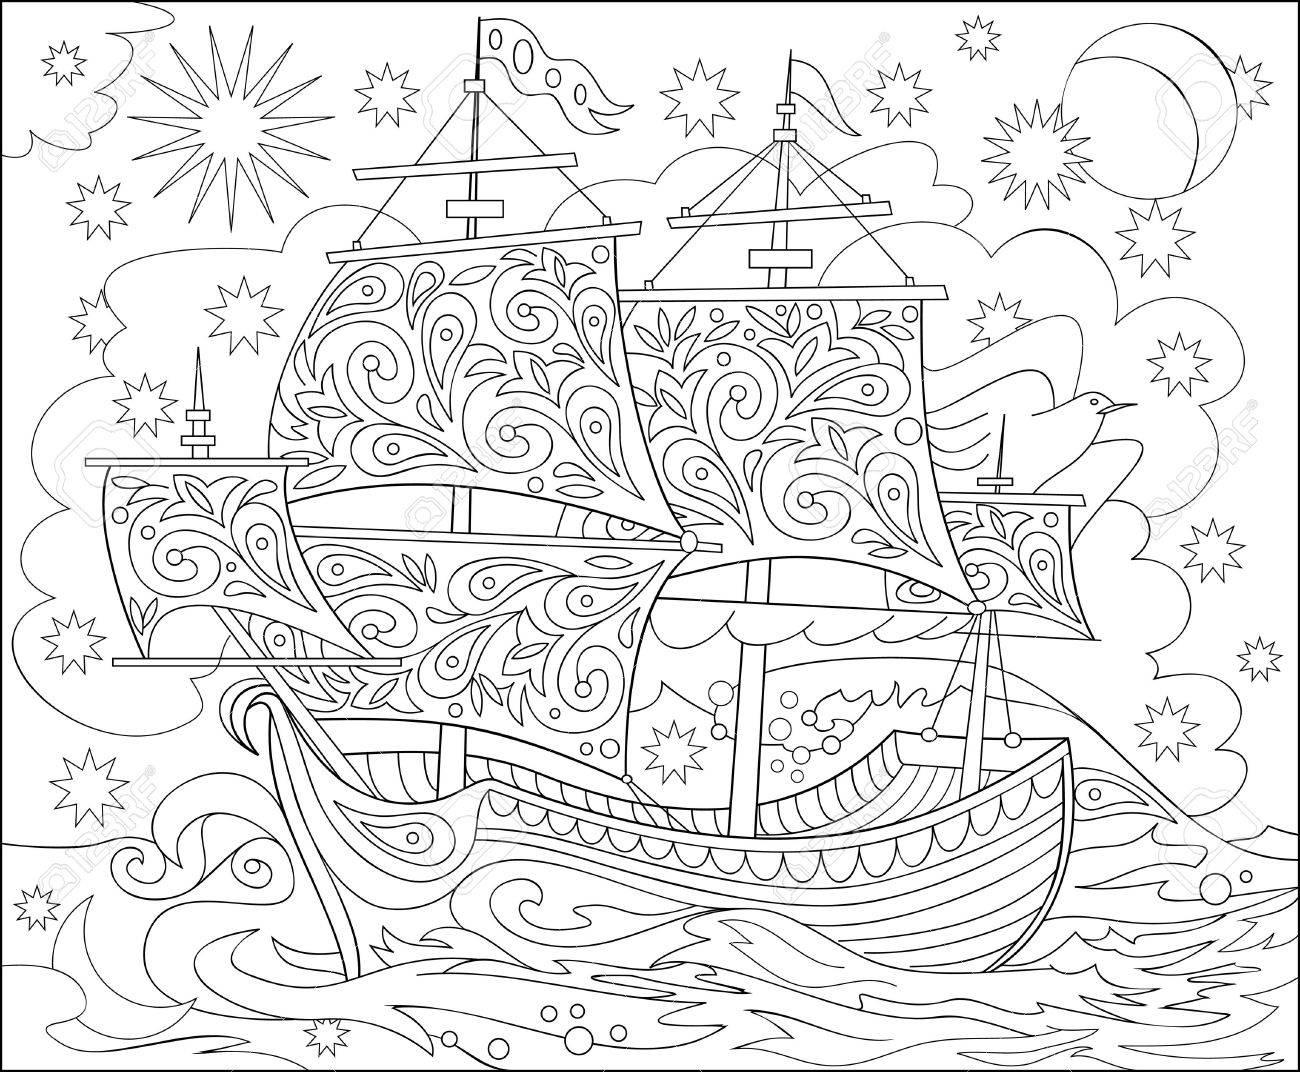 Pencil illustration of fantasy fairyland ship for coloring. - 71371419